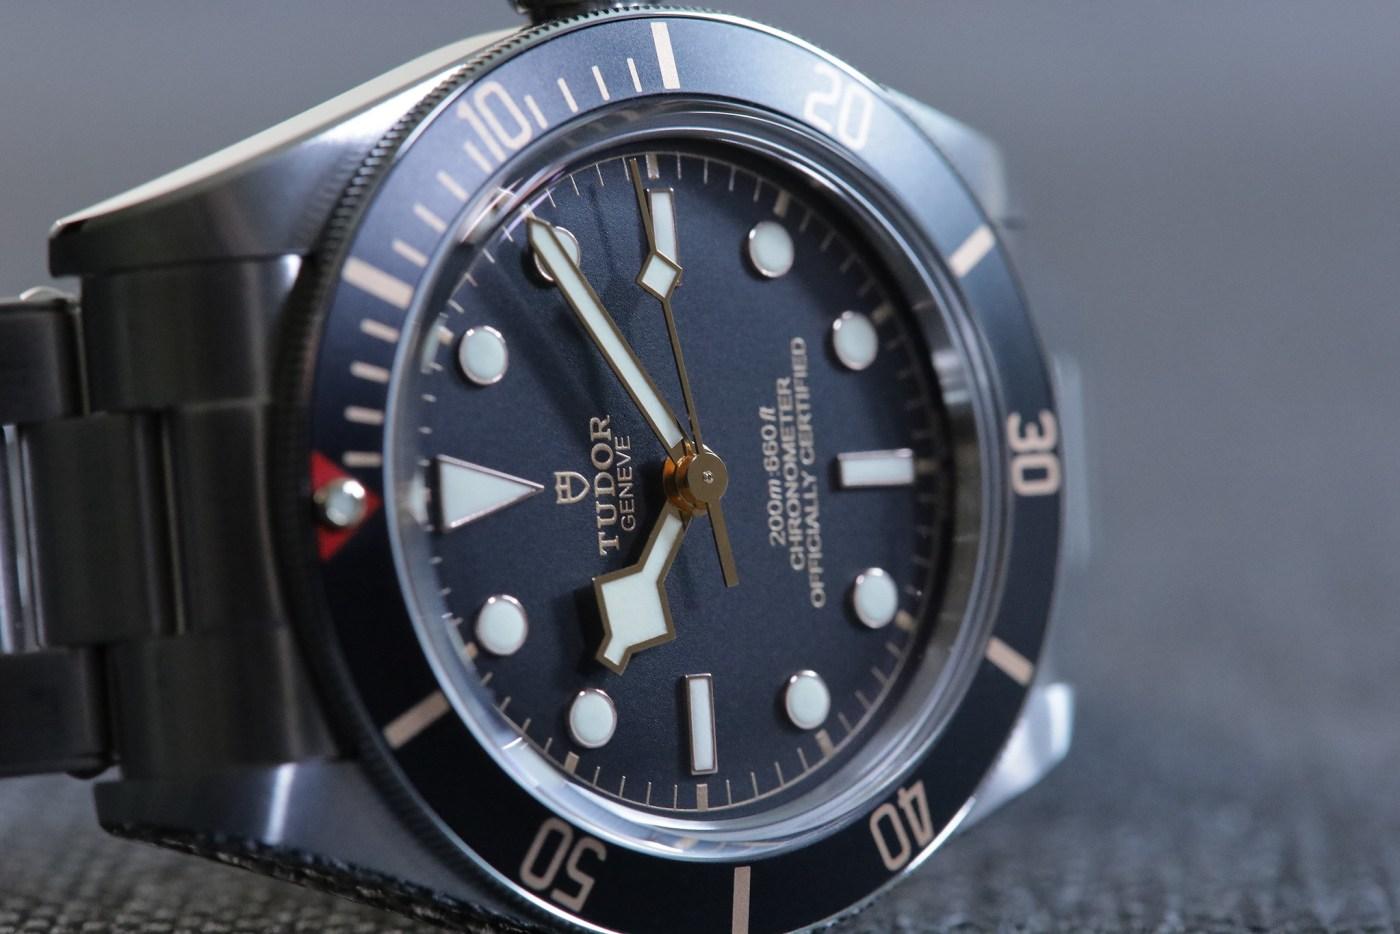 BB58 side dial detail